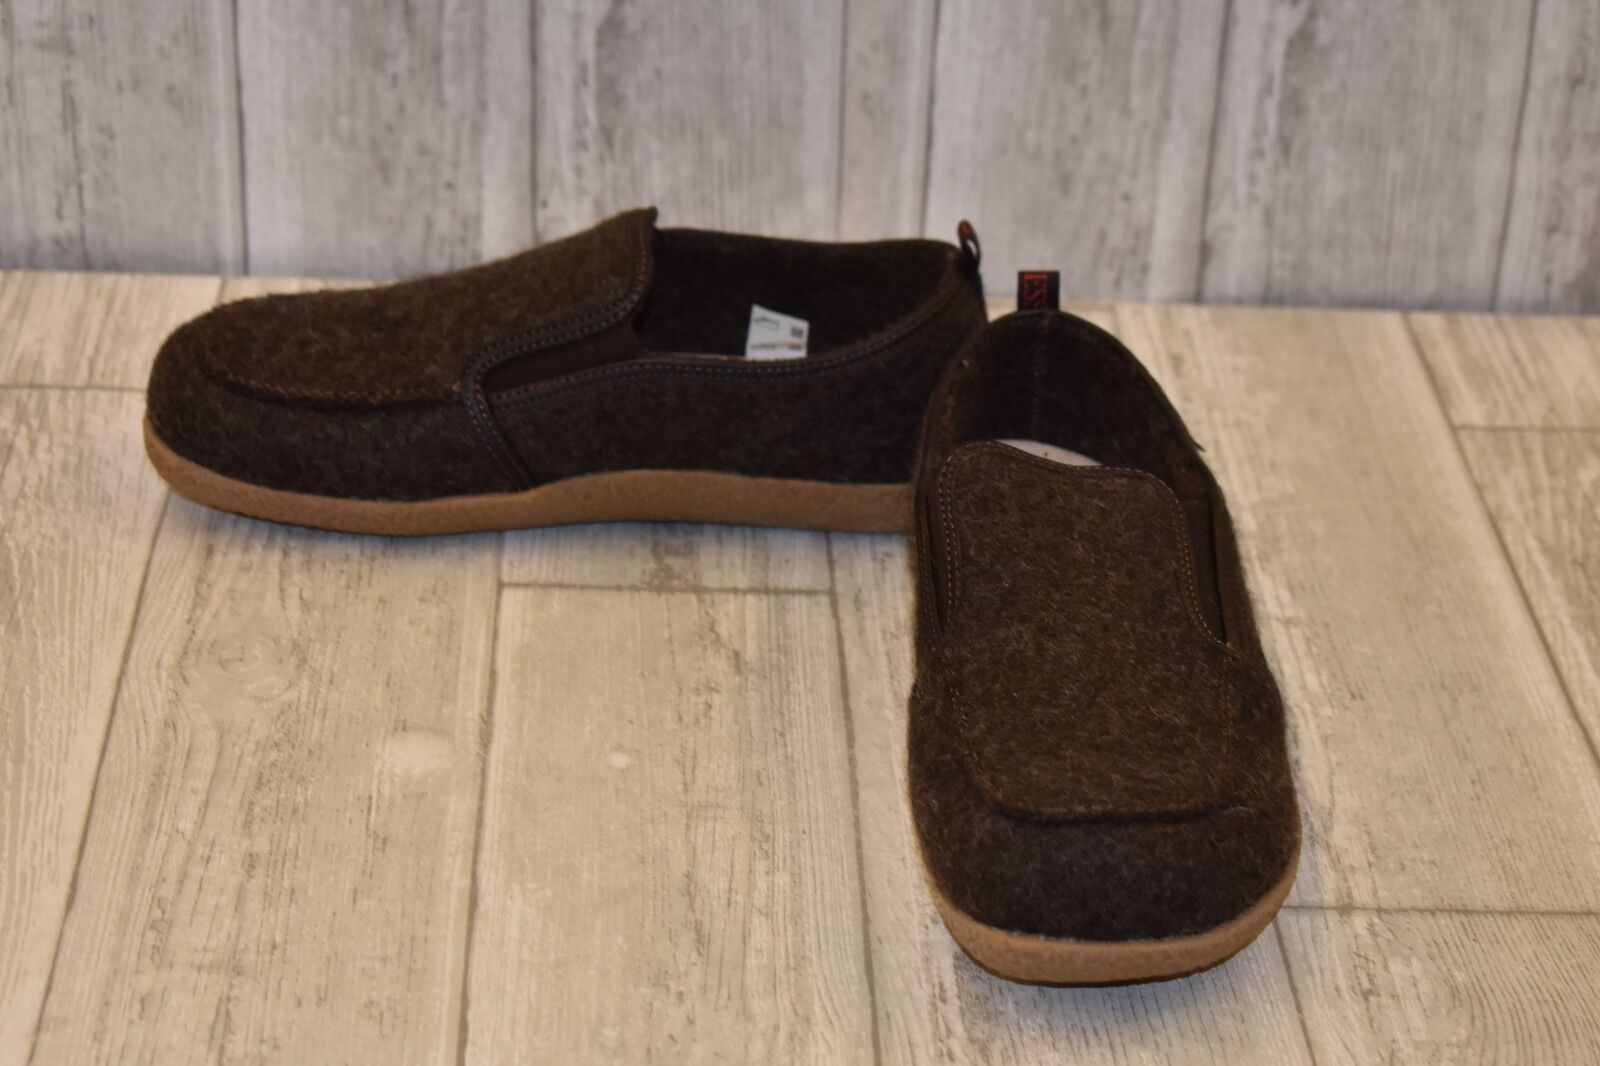 Giesswein Innsburck Slippers - Women's Size 7 - Dark Brown